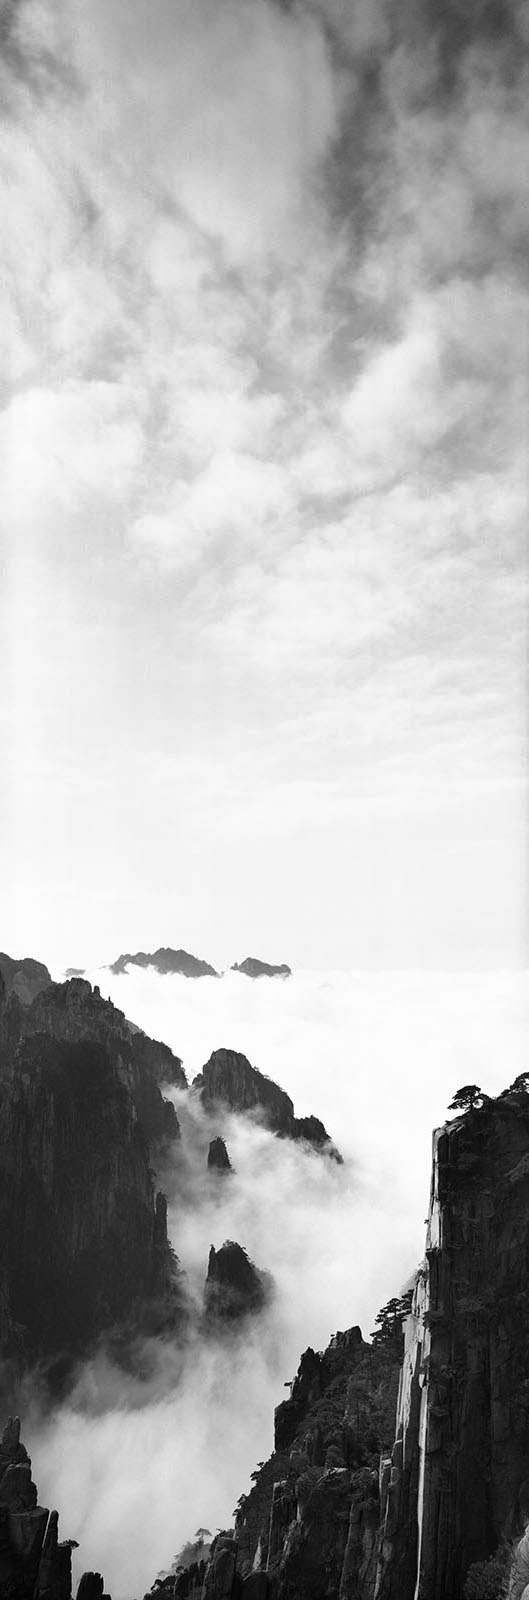 Zeng Nian, photo , signée et numérotée , 126,6 x 42,5 cm